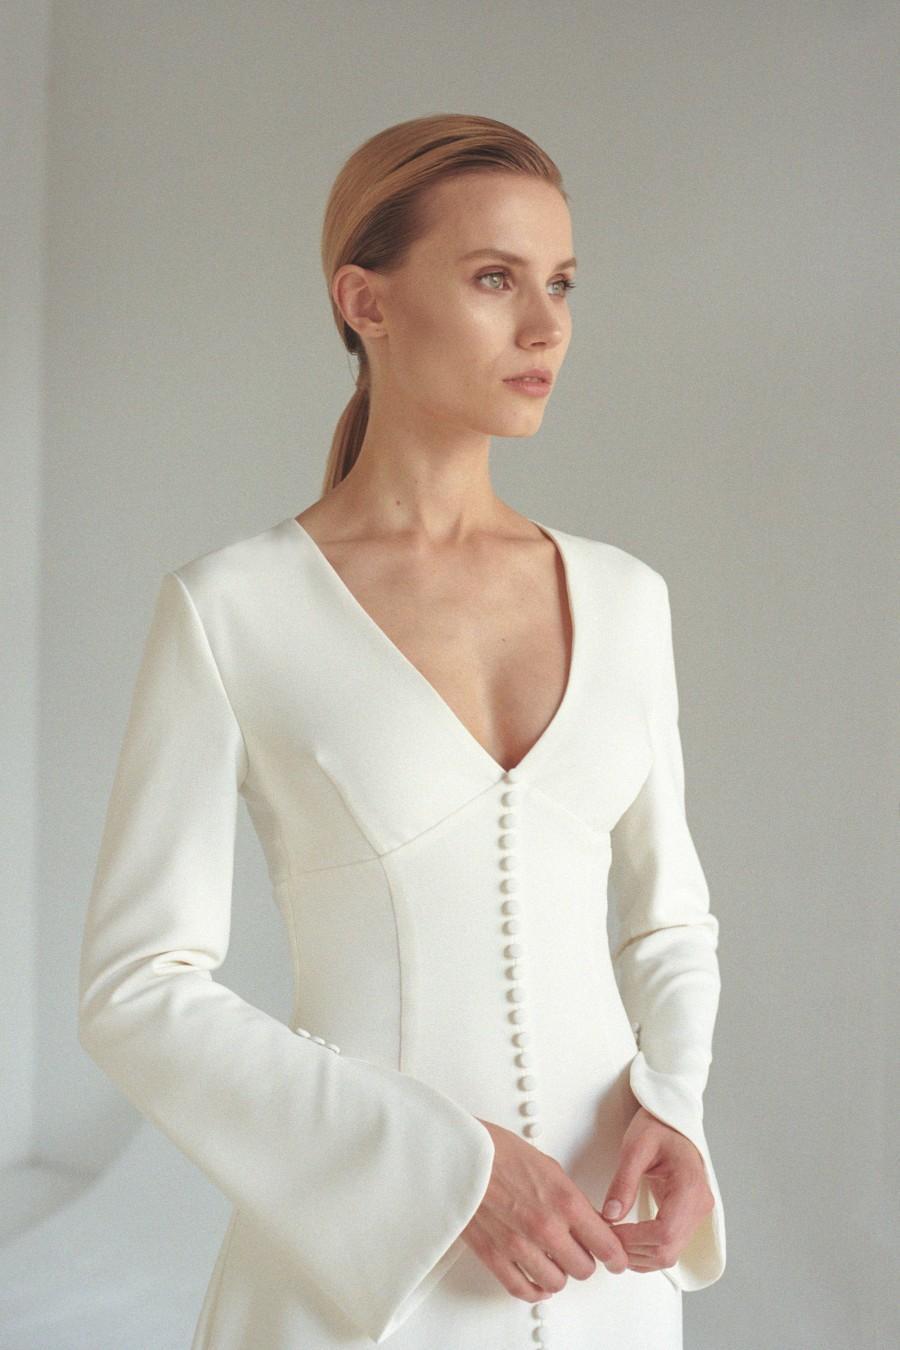 Hochzeit - Boho flared sleeve wedding dress Button front bridal gown Deep V neck wedding dress with center split A line and train bridal dress COLETTE